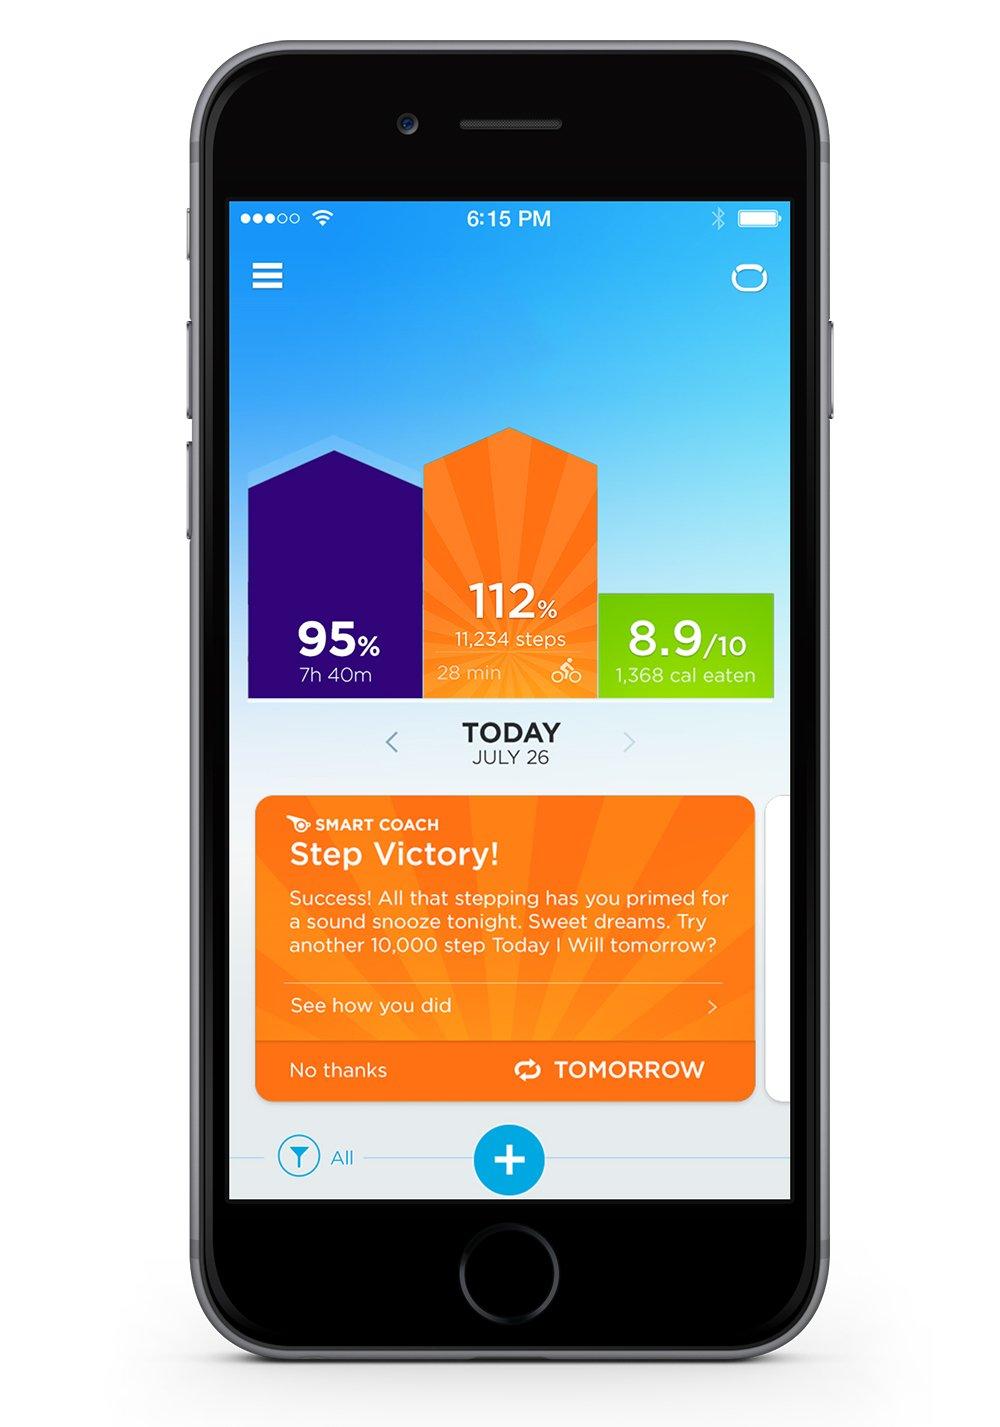 Jawbone Activity Tracker Turquoise Lightweight Image 2